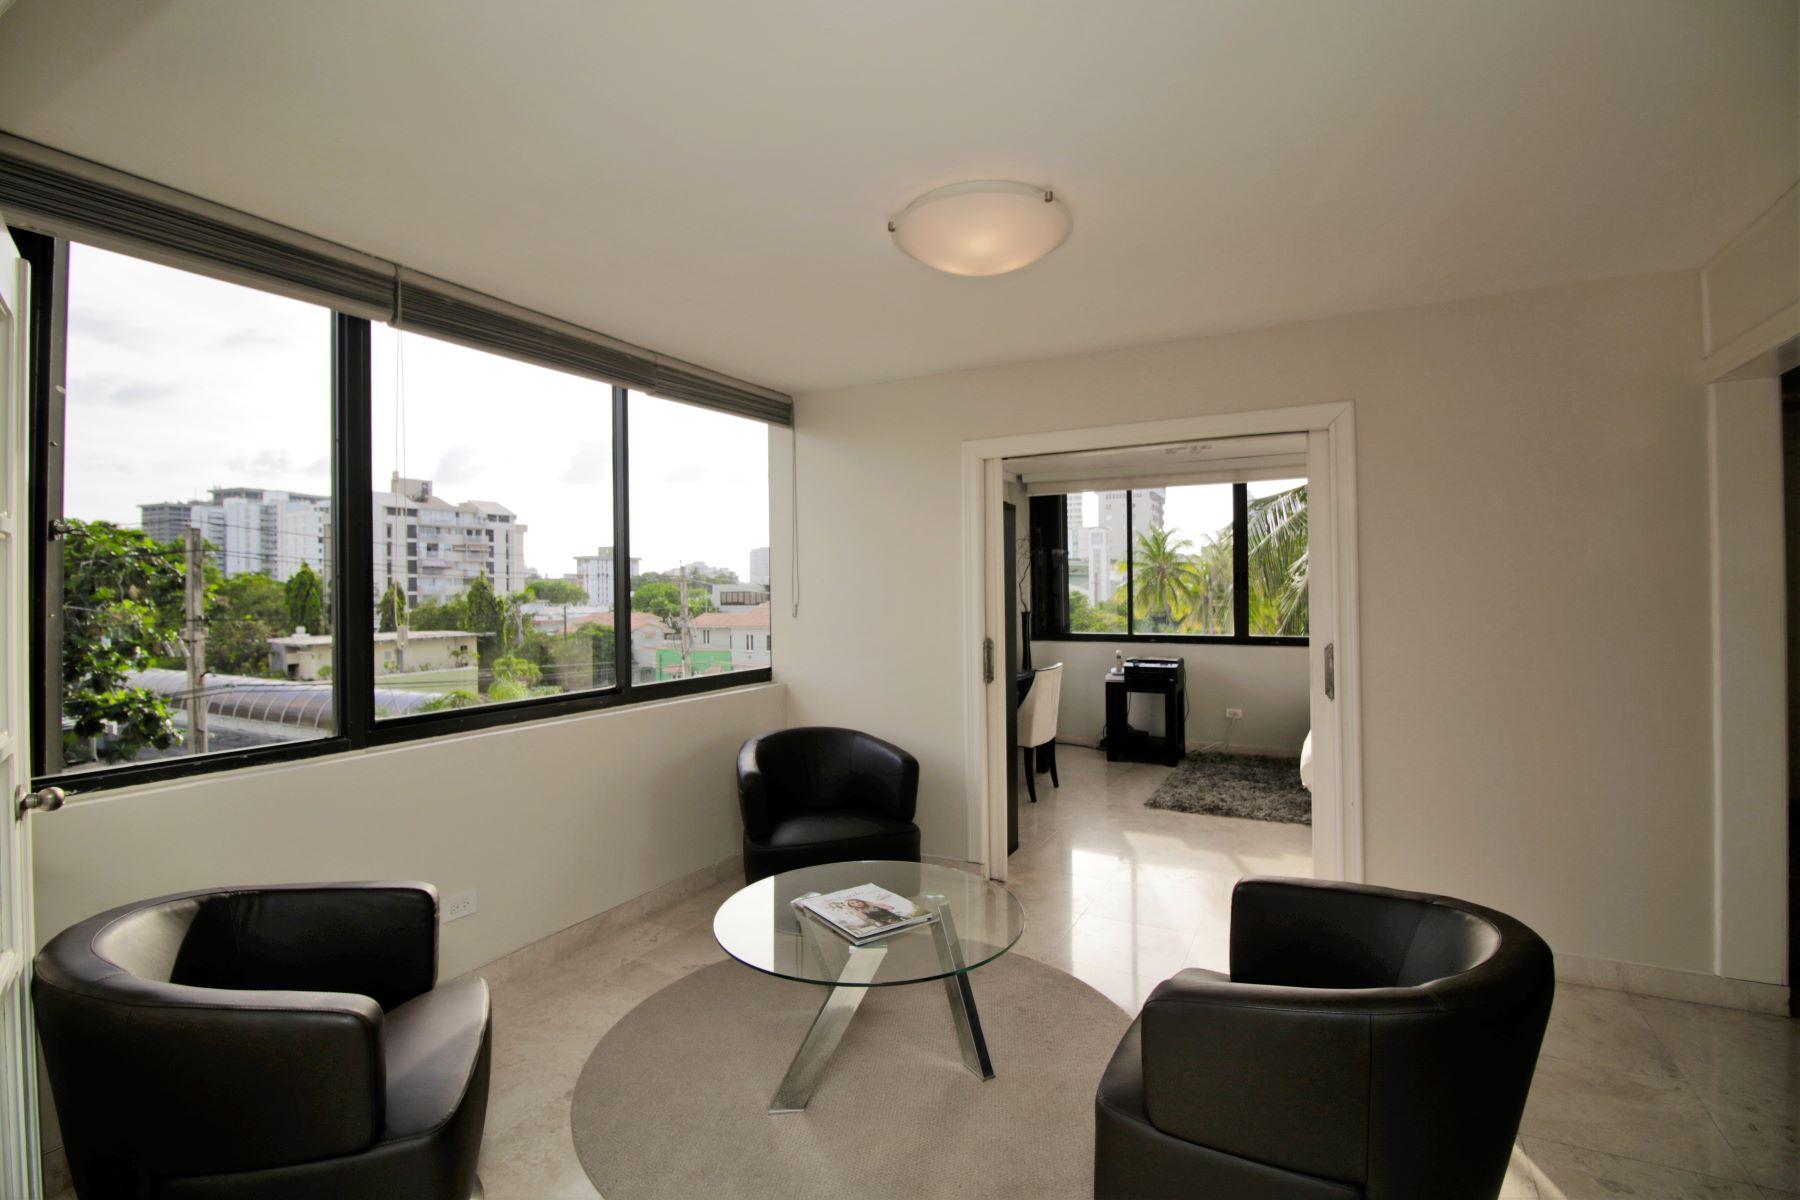 Additional photo for property listing at Expansive Three Bed Rental at La Ceiba 1483 Avenida Ashford Apt 402 San Juan, Puerto Rico 00907 푸에르토리코